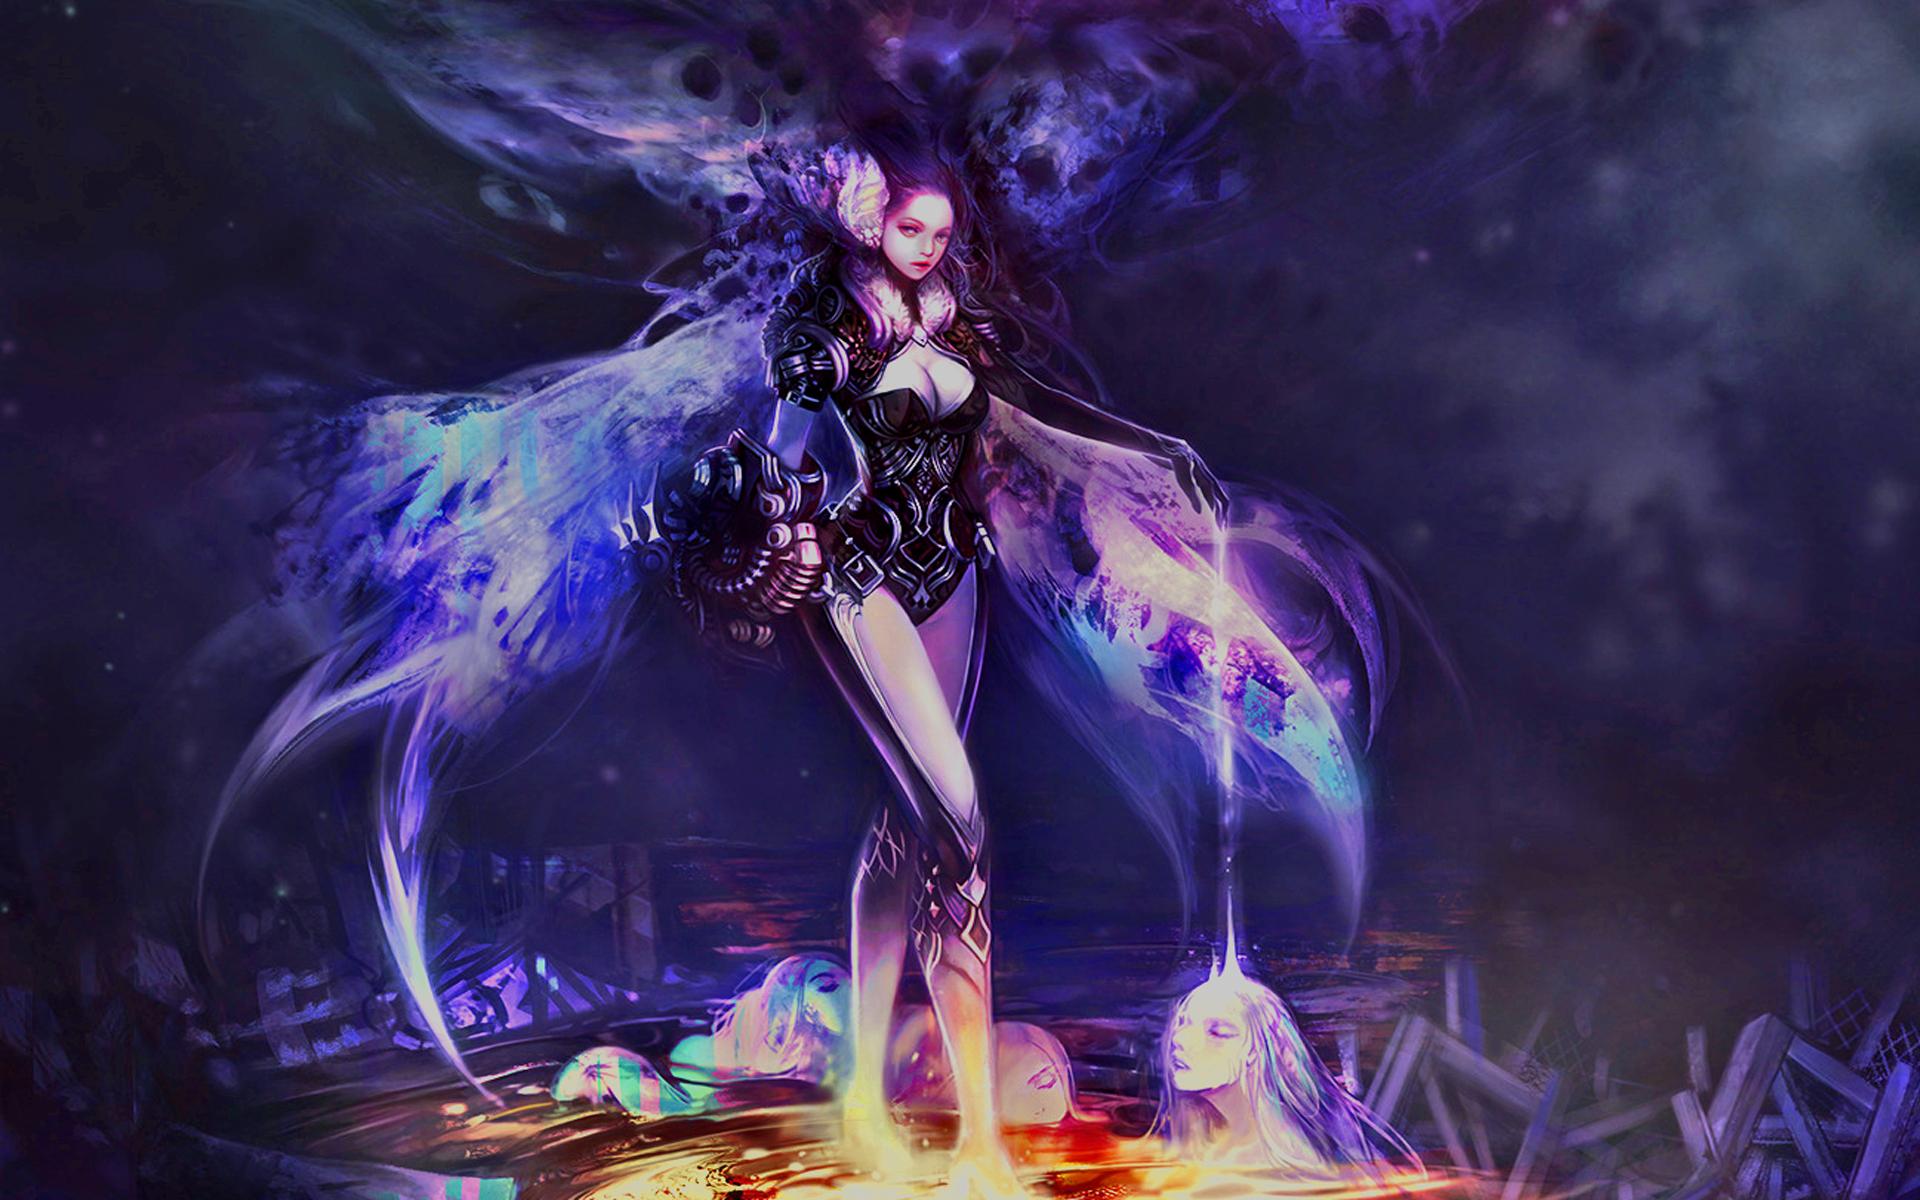 Cyborg Dark Girl Magic Fantasy Sci Fi Wallpaper